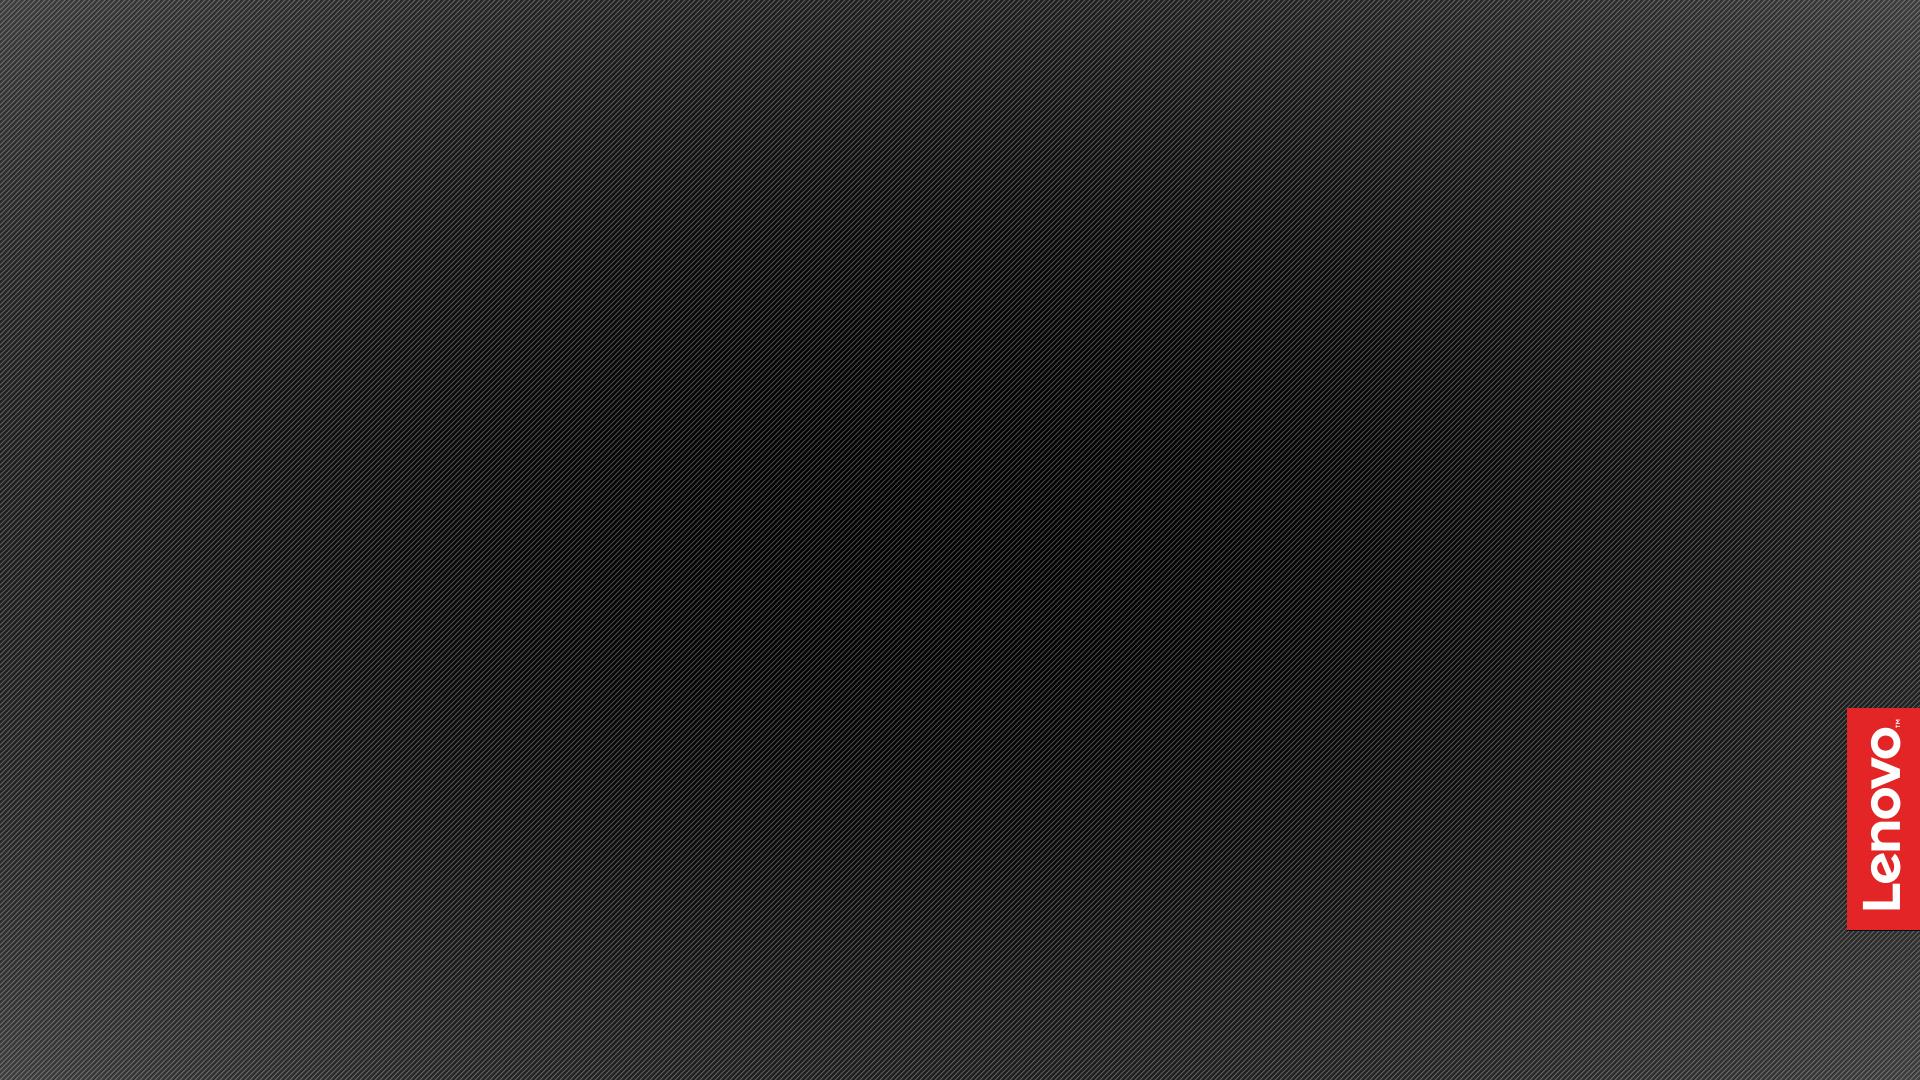 Wallpaper Lenovo Simple Background Minimalism 1920x1080